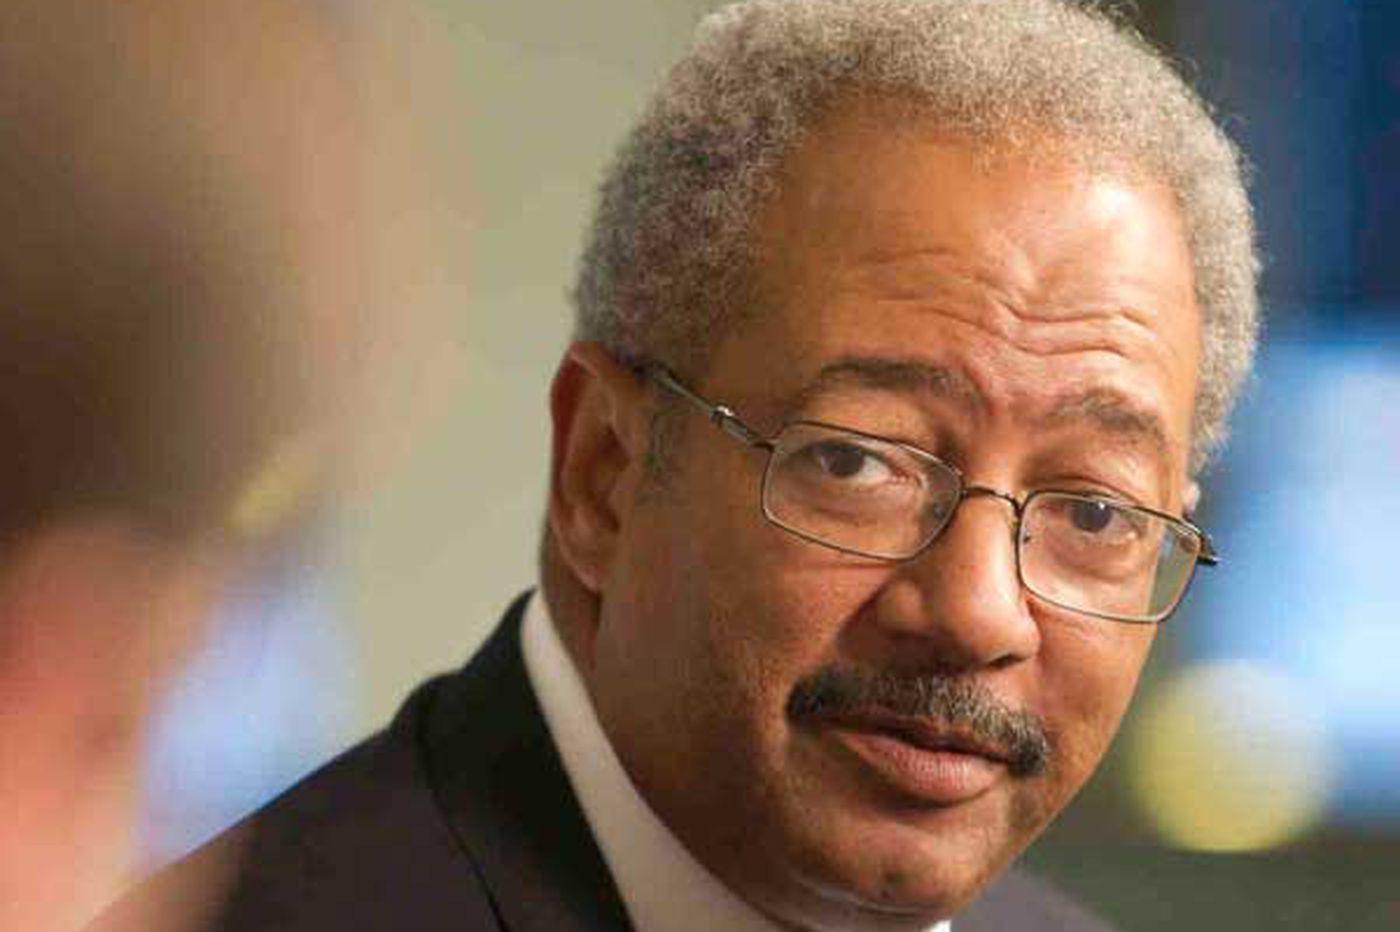 FBI seeks Fattah records; lawyer calls probe long-running